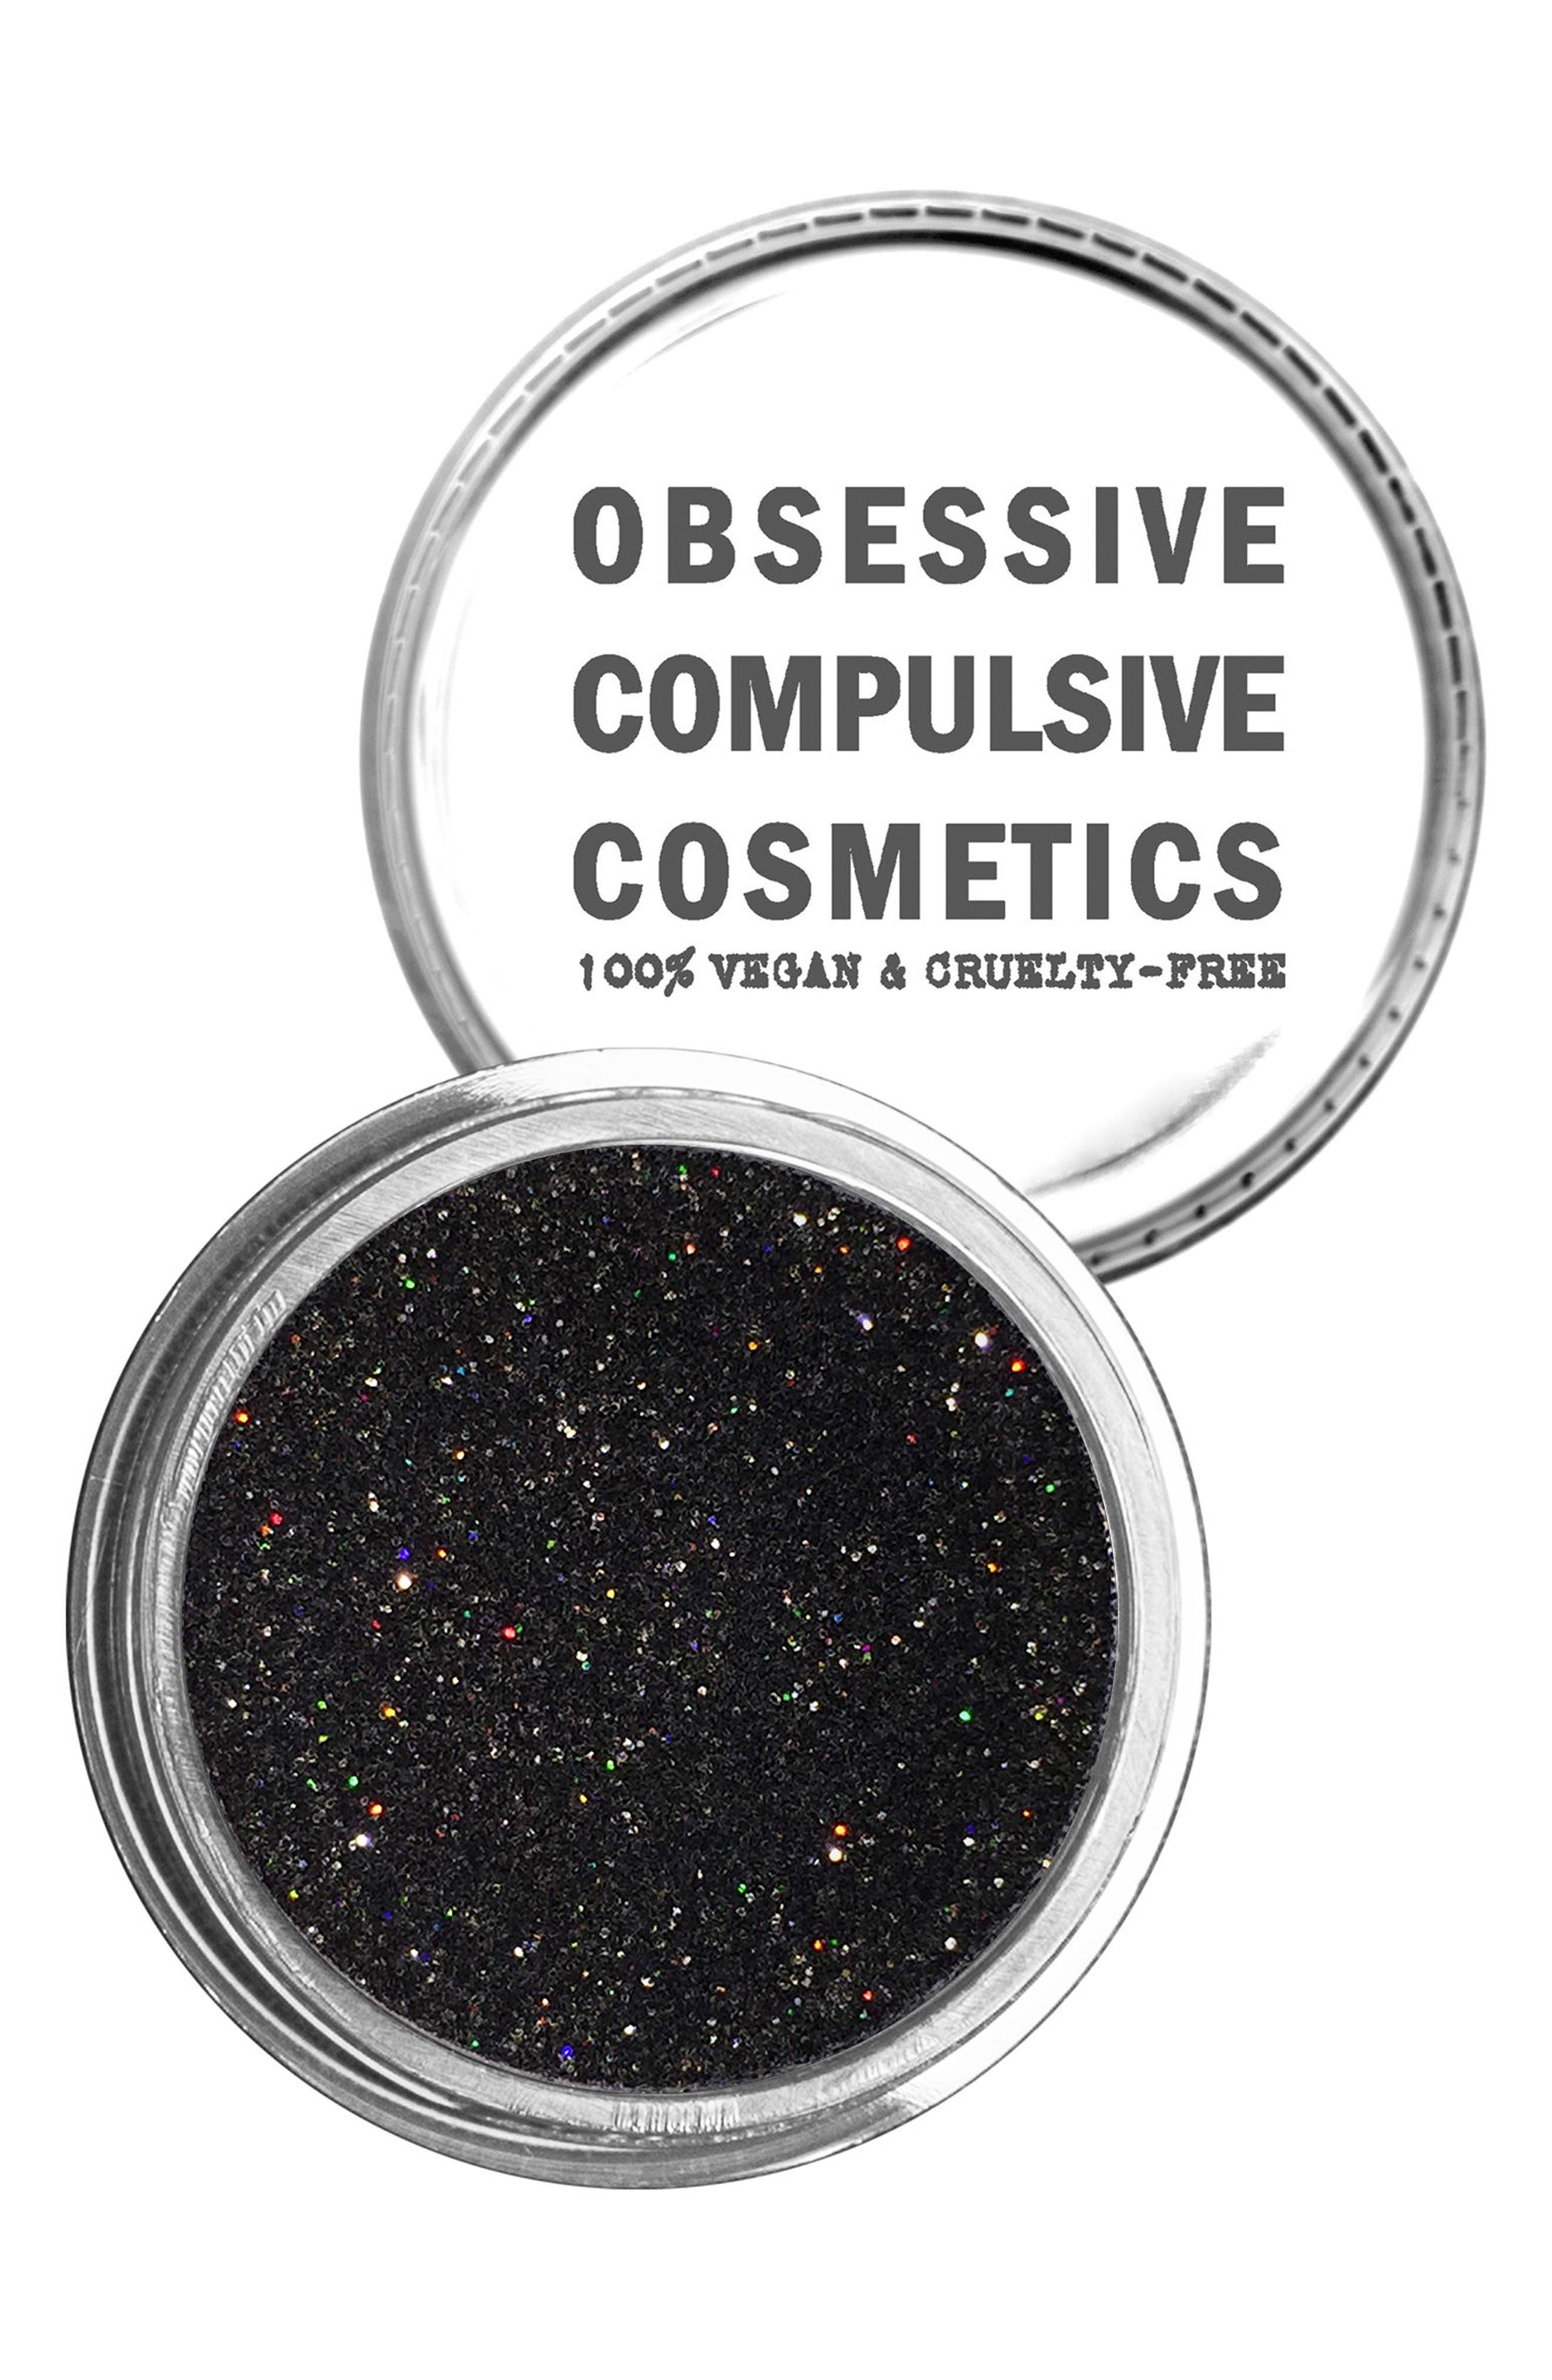 Alternate Image 1 Selected - Obsessive Compulsive Cosmetics Cosmetic Glitter